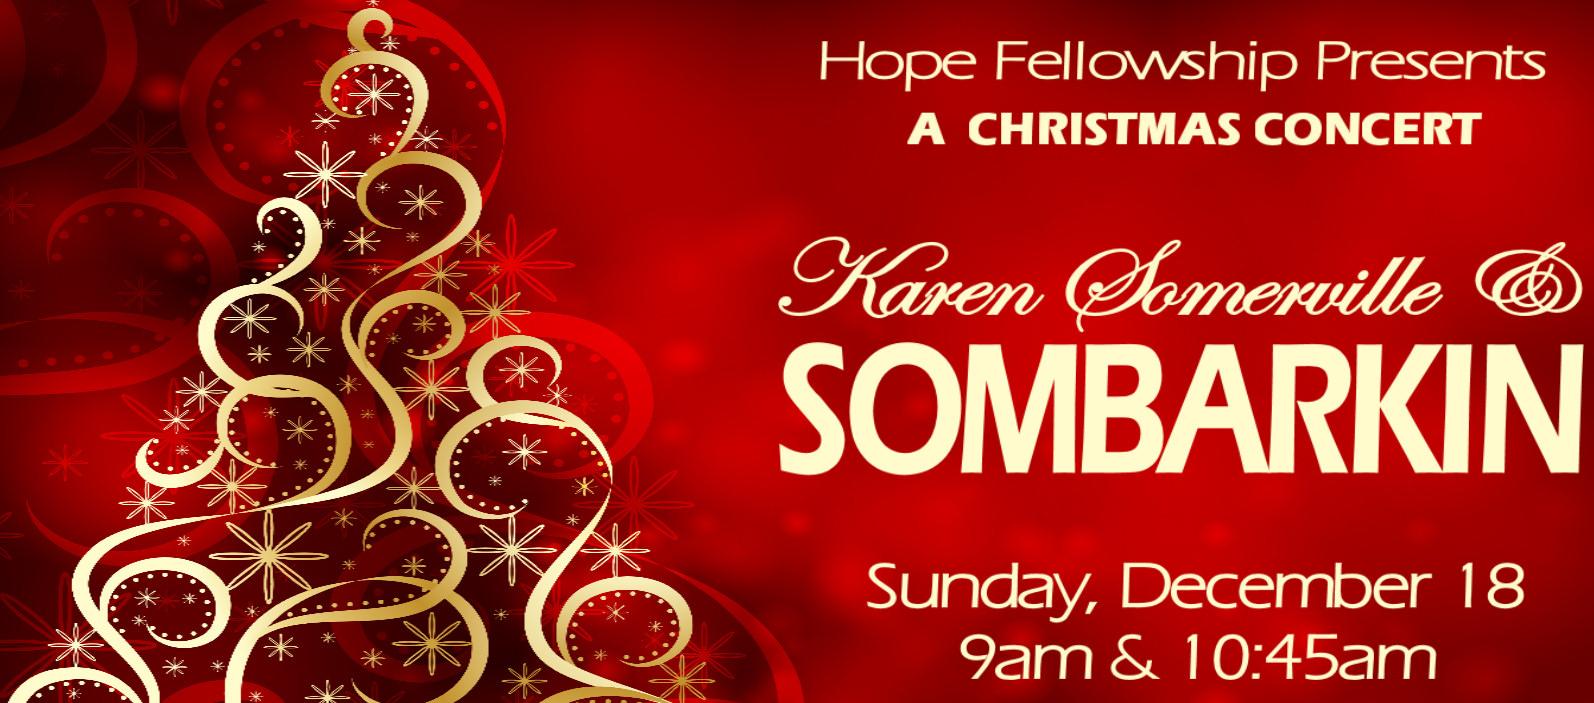 "A Christmas Concert:  Karen Somerville & Sombarkin"""